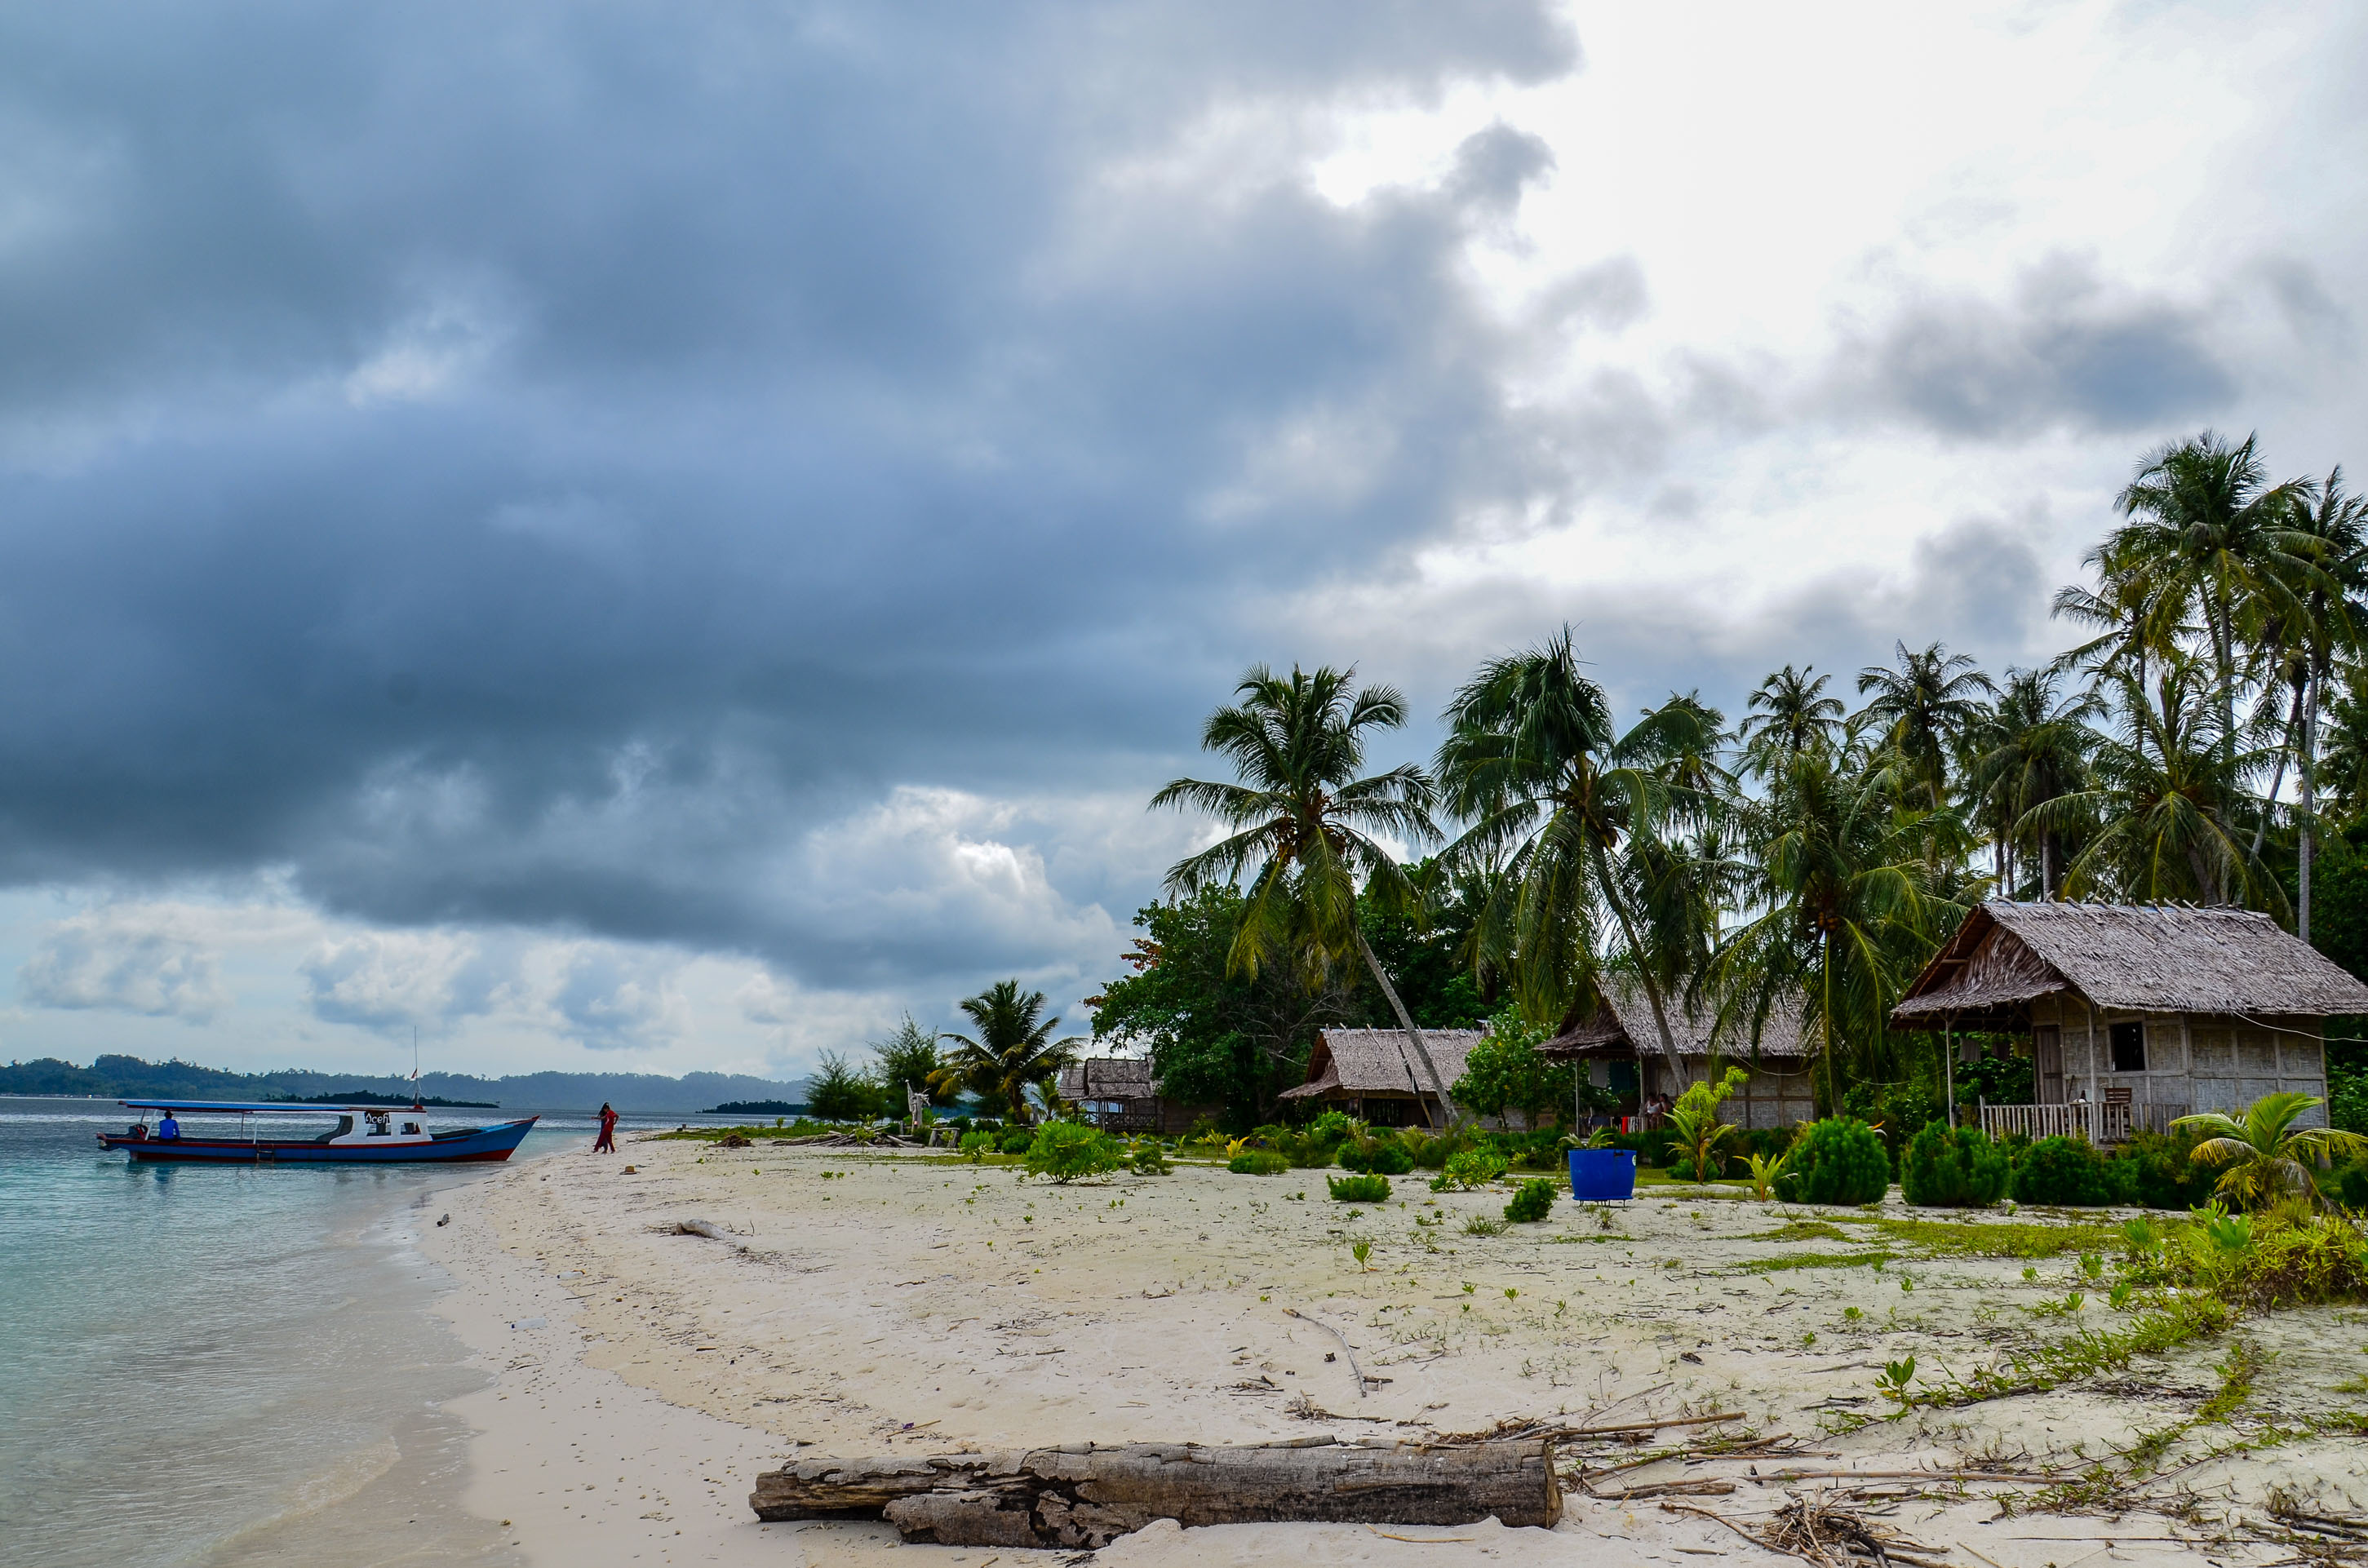 Domki The Coral na wyspie Sikandang. Wyspy Banyak, Indonezja